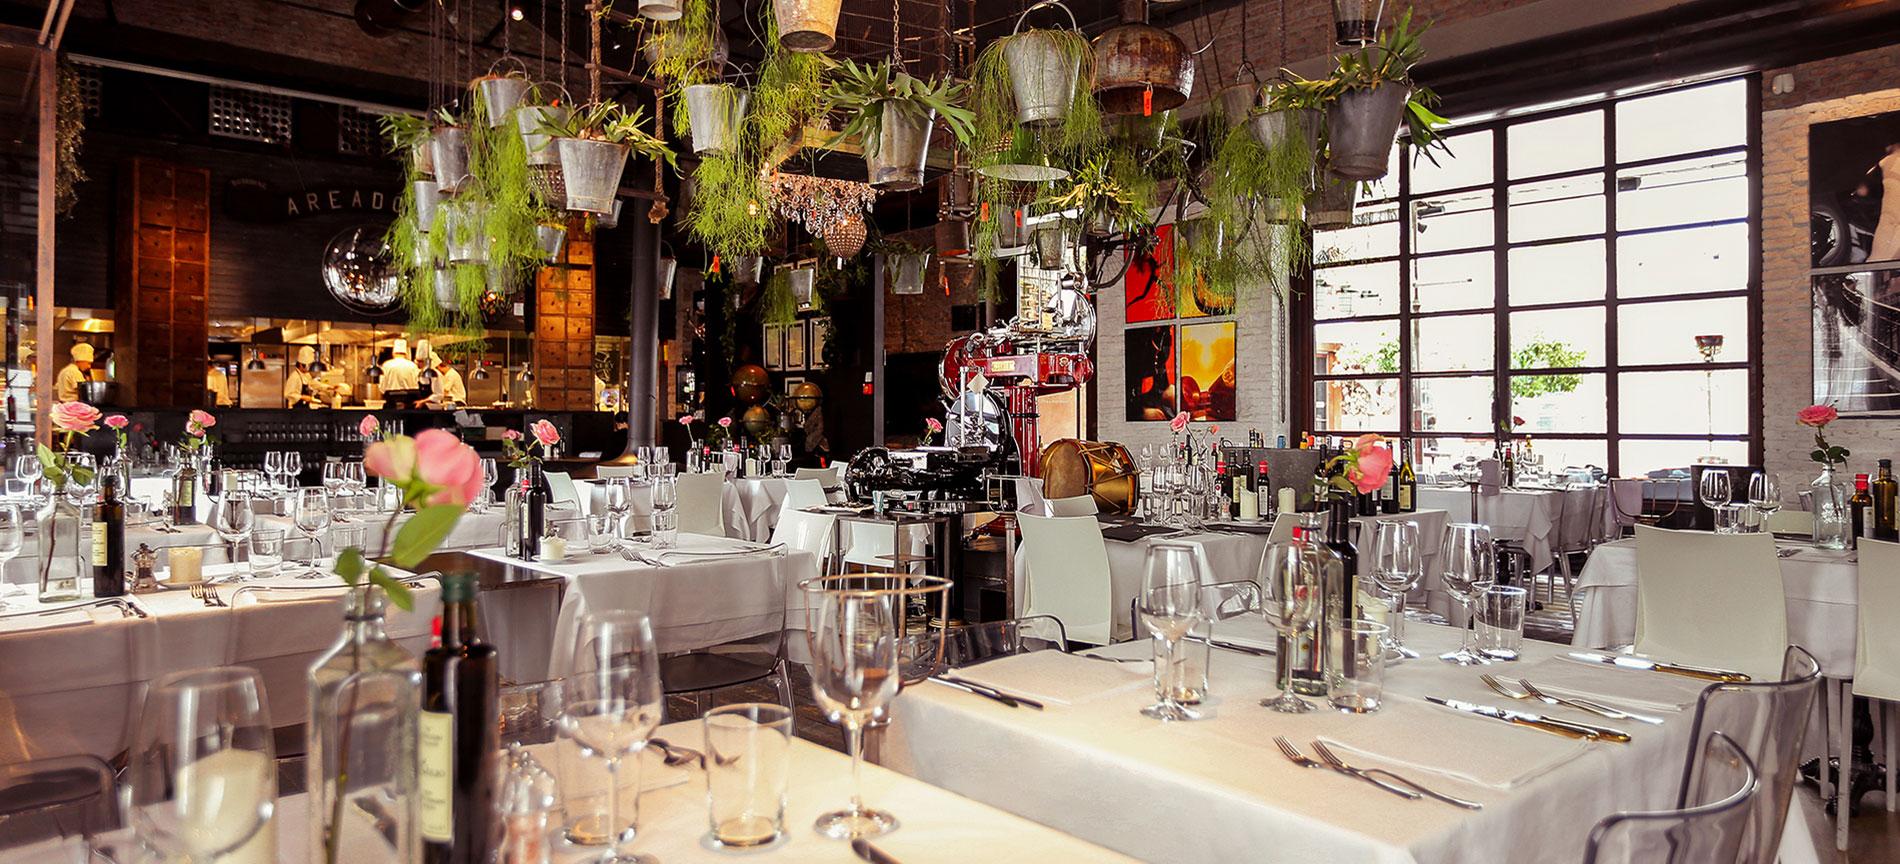 Areadocks ristorante